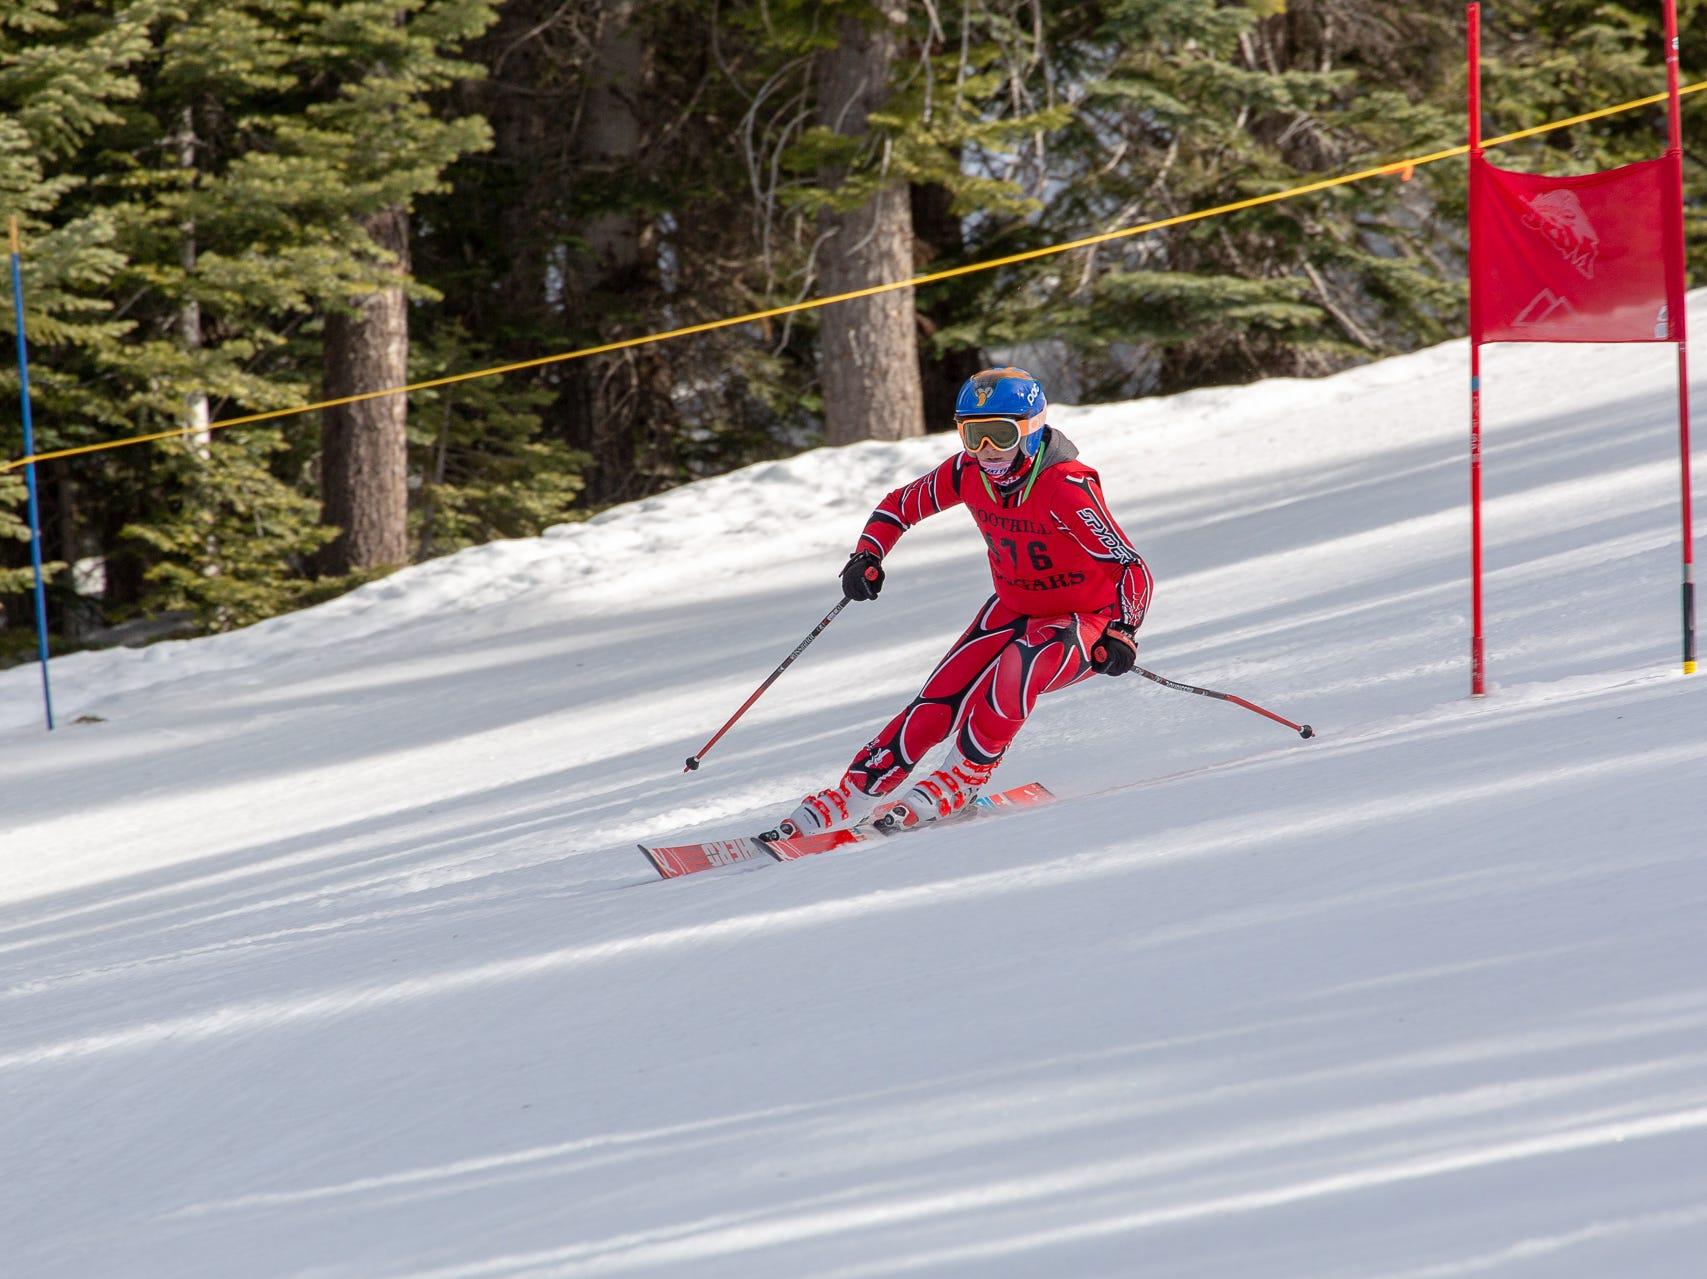 Matthew Ferrari of Foothill races in the third high school ski meet of 2019 on Monday, Jan. 28 at Mt. Shasta Ski Park.